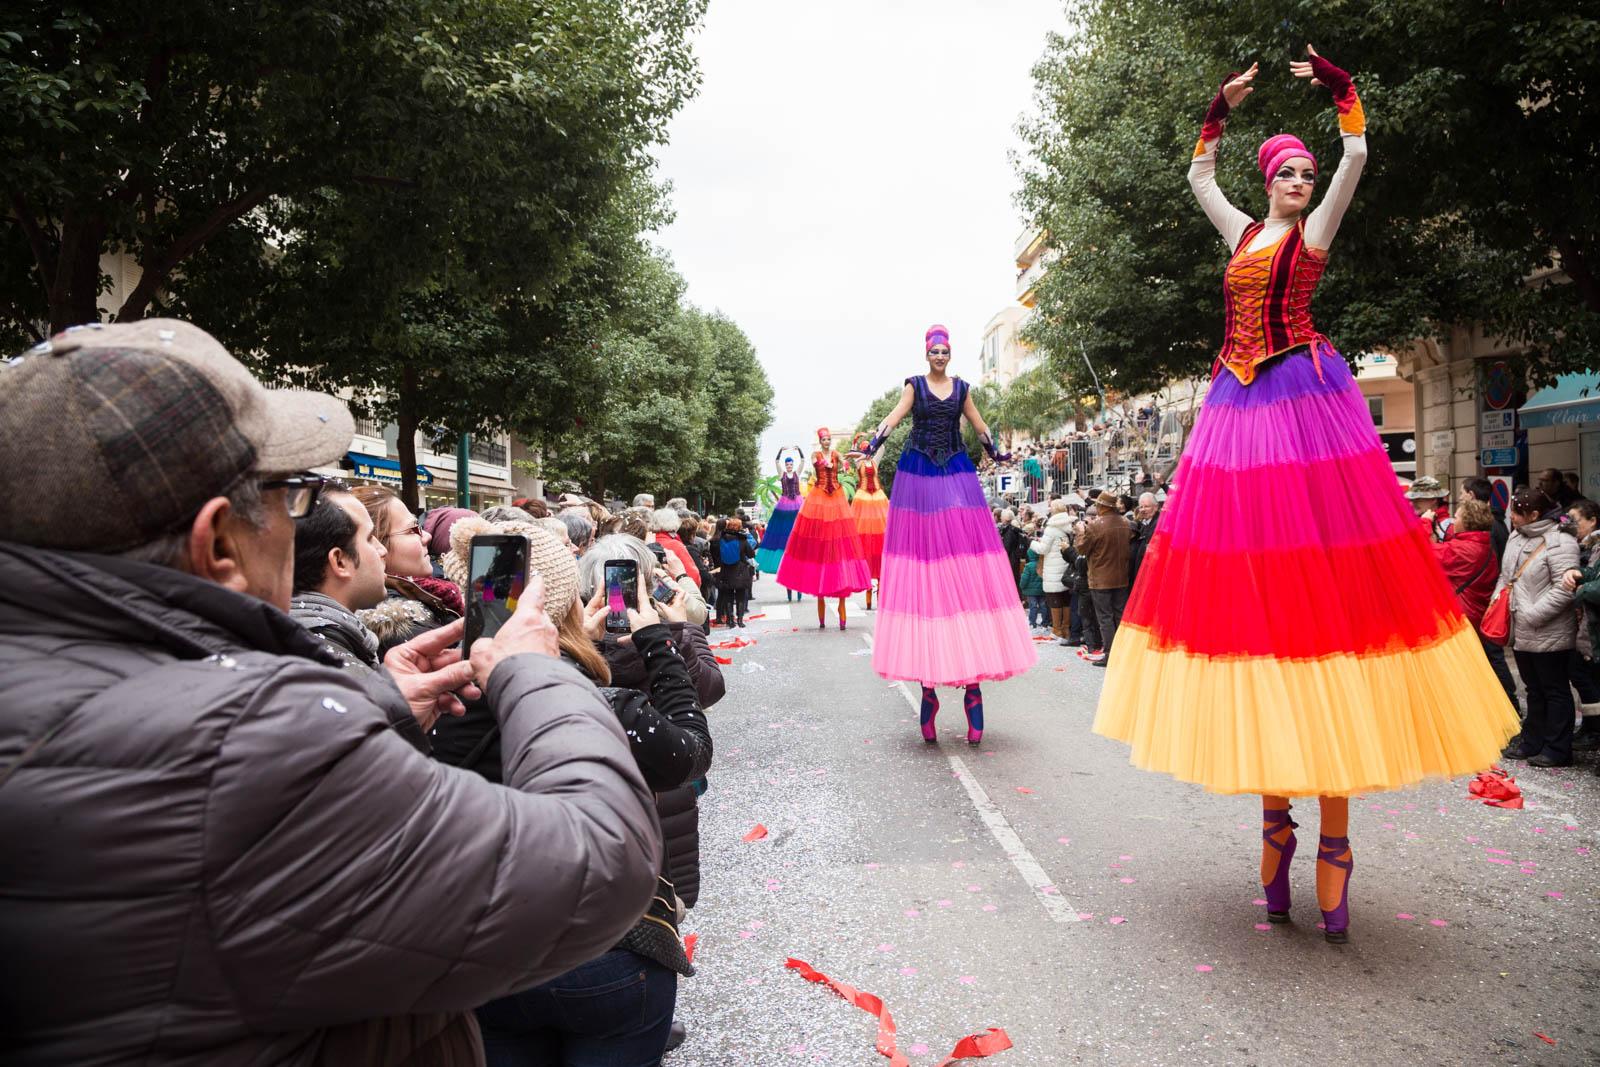 Carnaval Menton, France, Carnival, Lemons, Oranges  - ? Ivan Blanco 2016